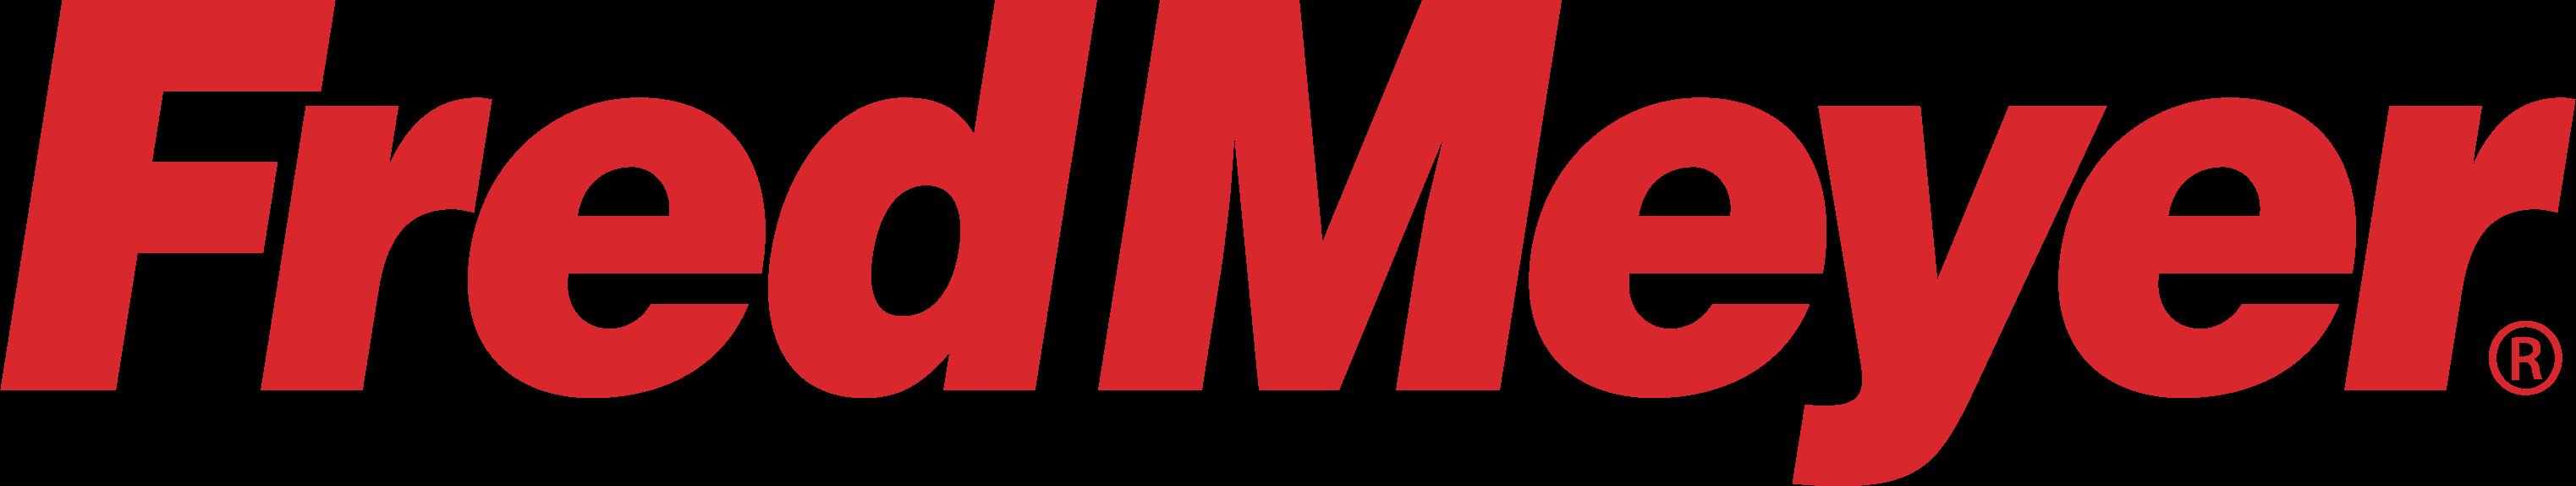 Fred Meyer Hypermarket Logo